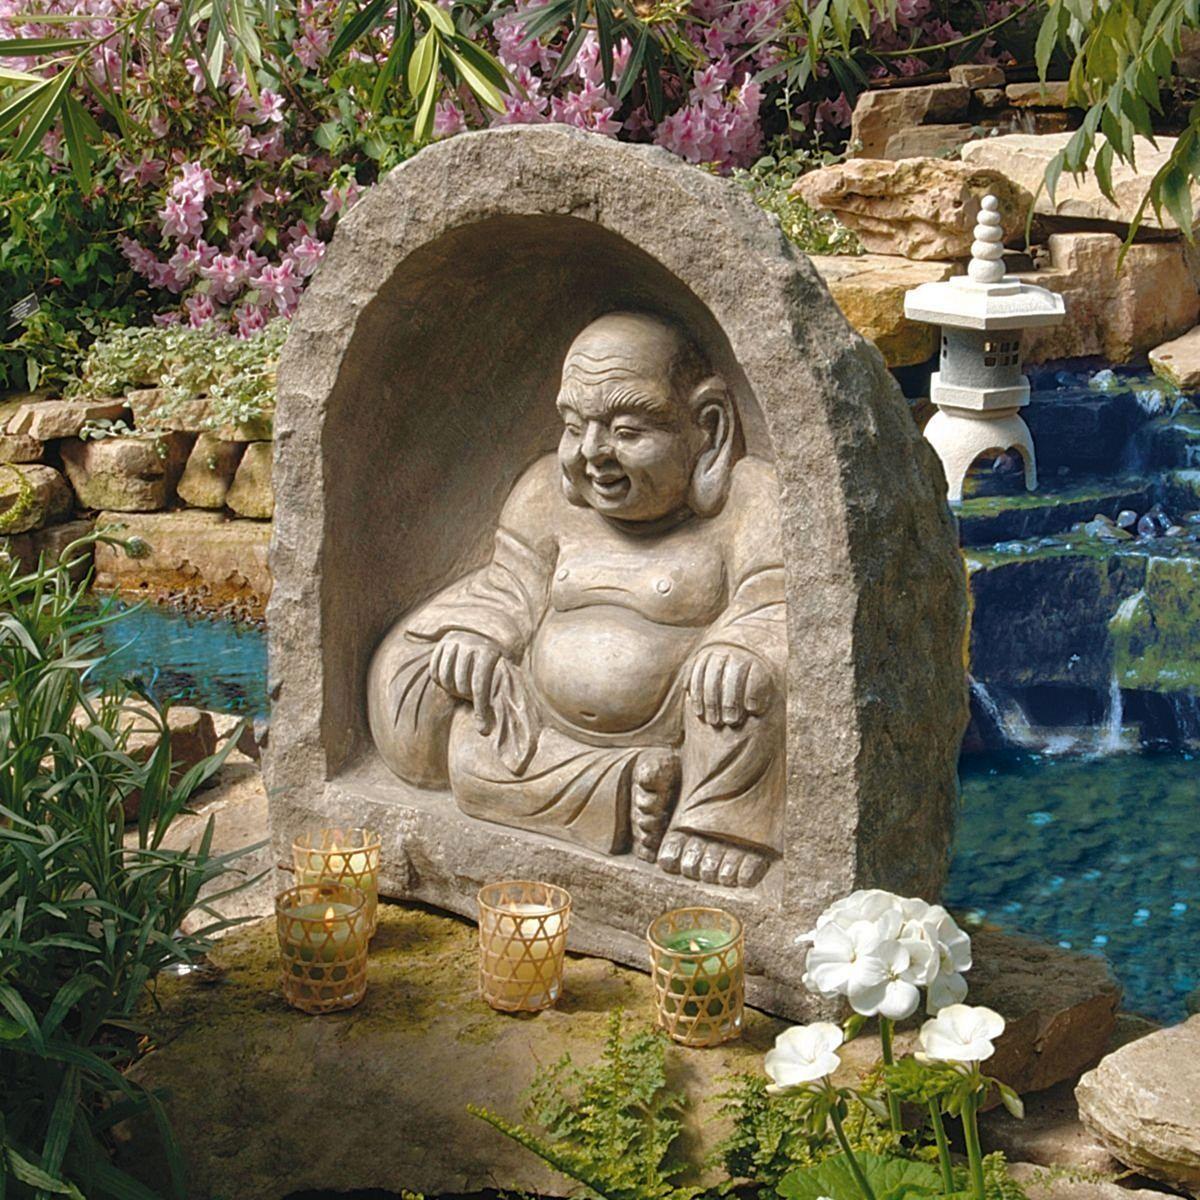 Asian garden sculpture, elisha sex